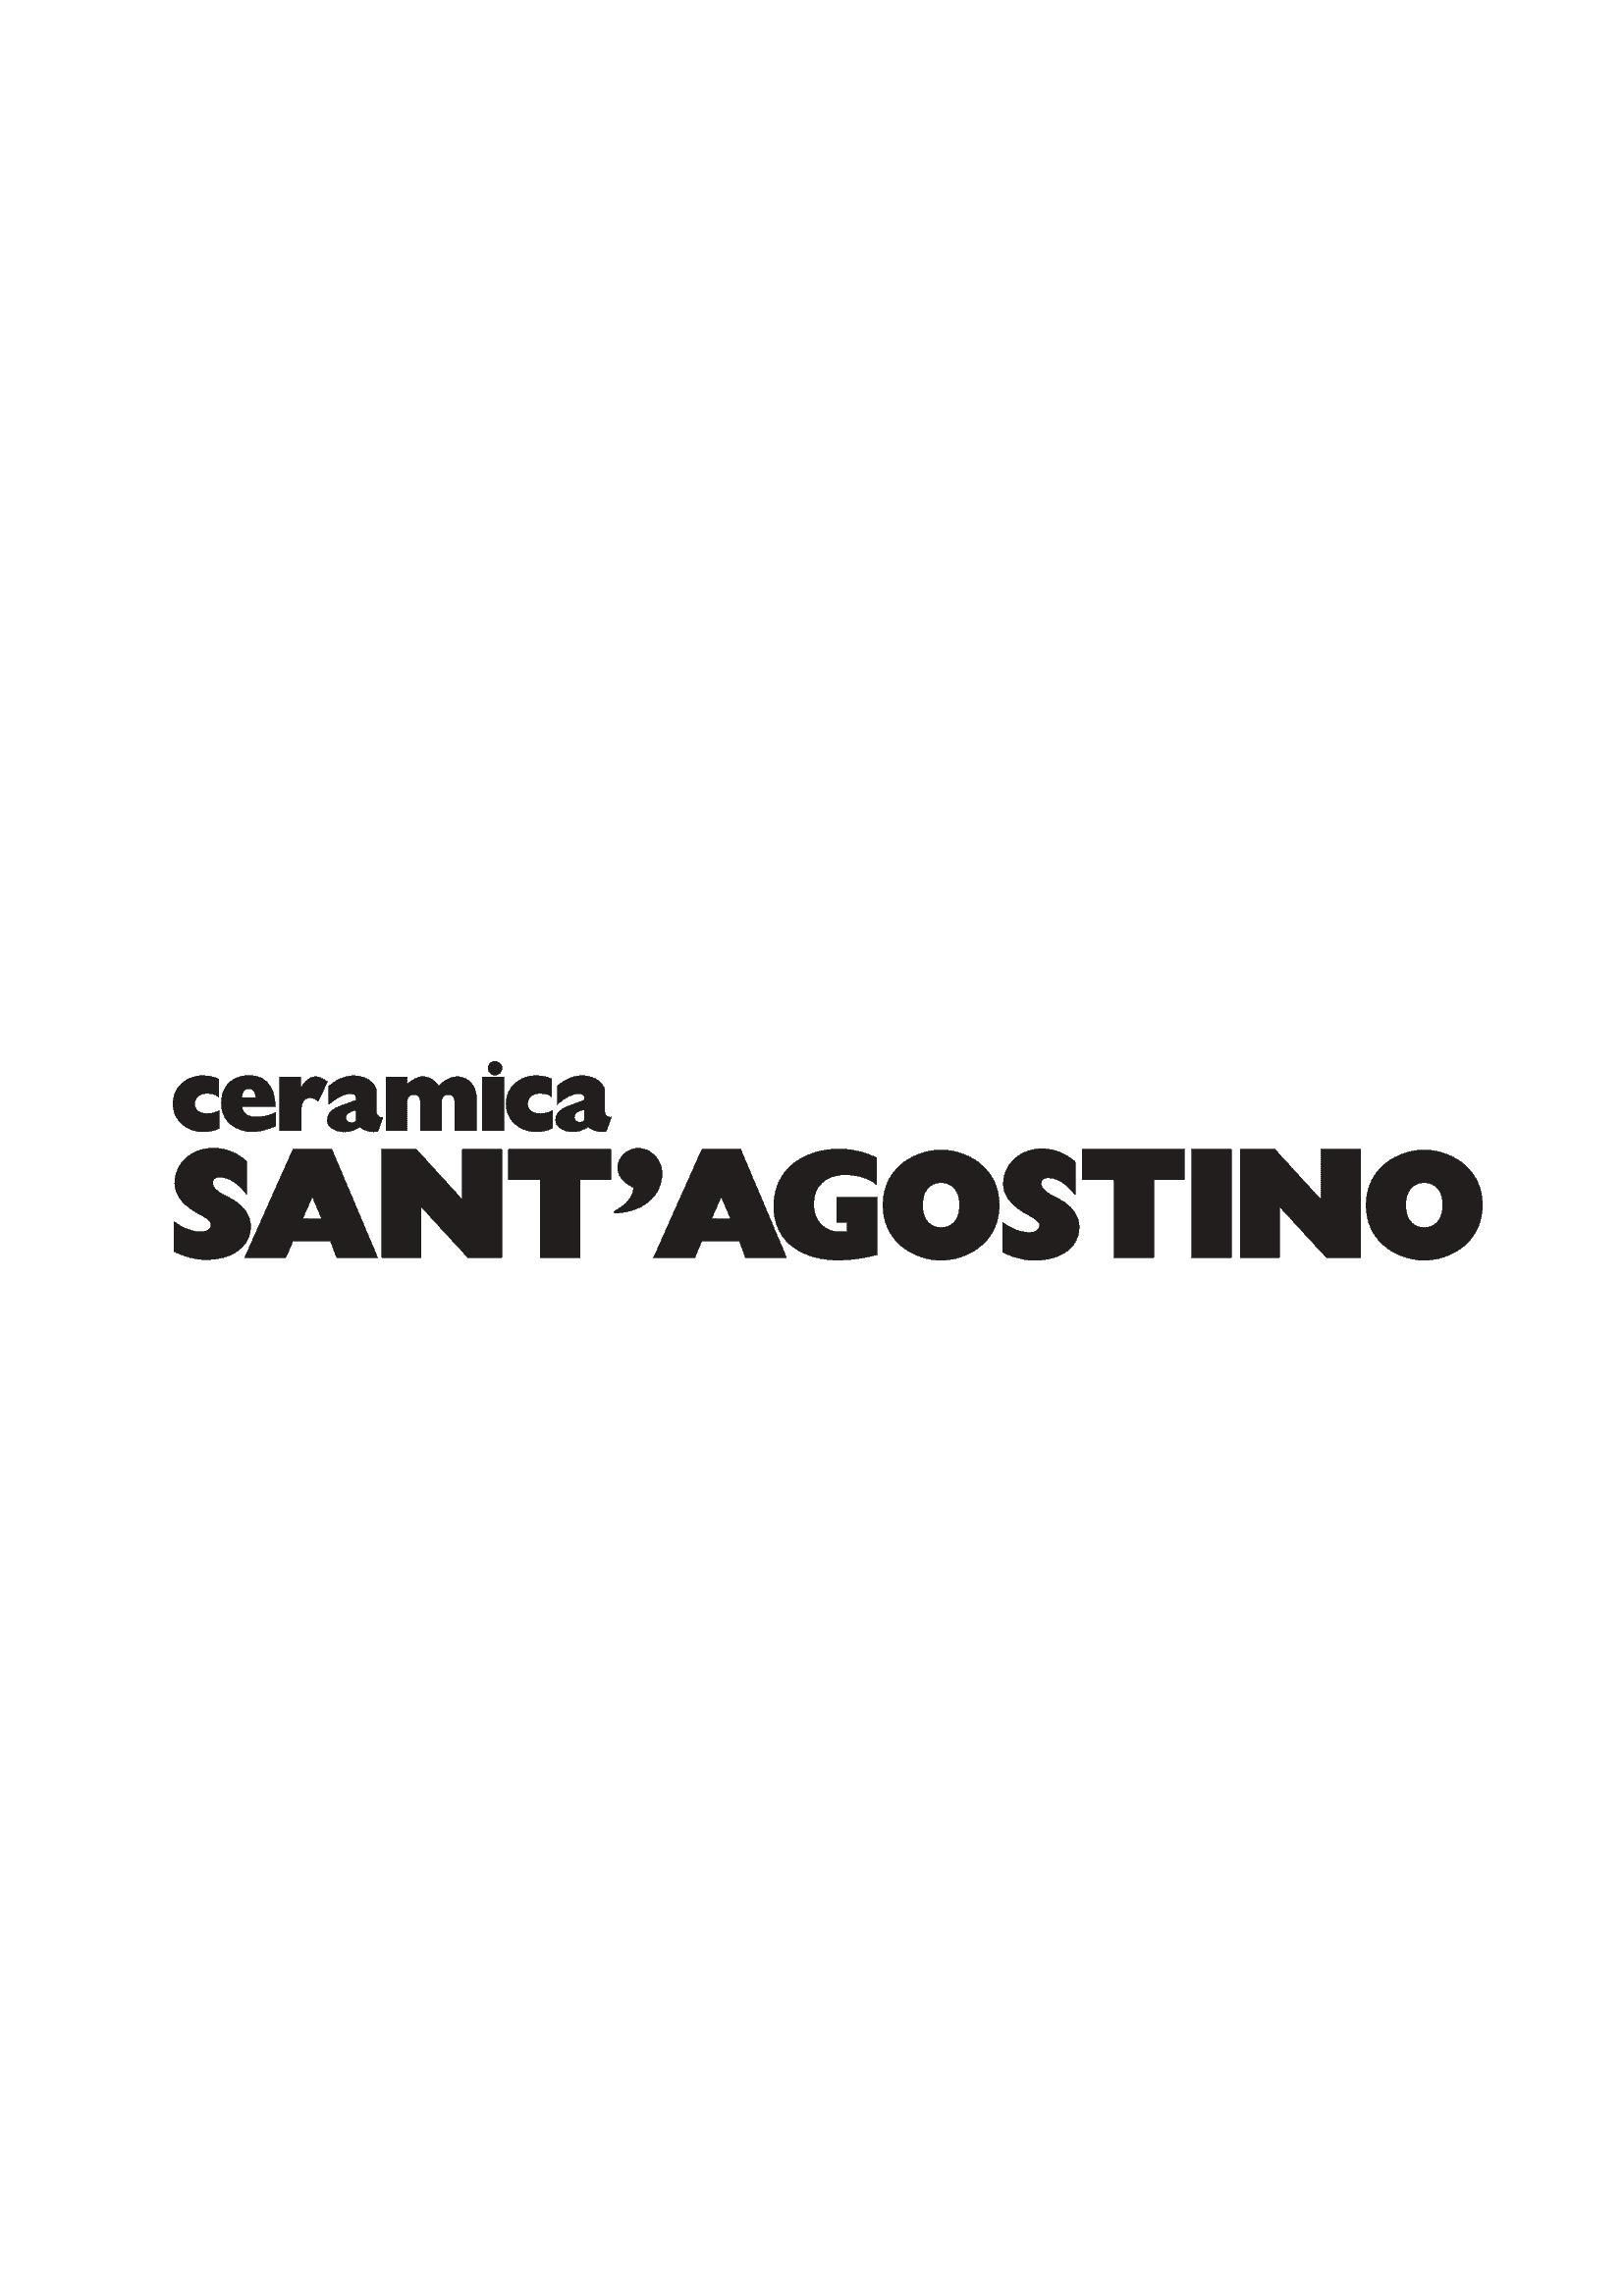 SANT'AGOSTINO_Logo.png